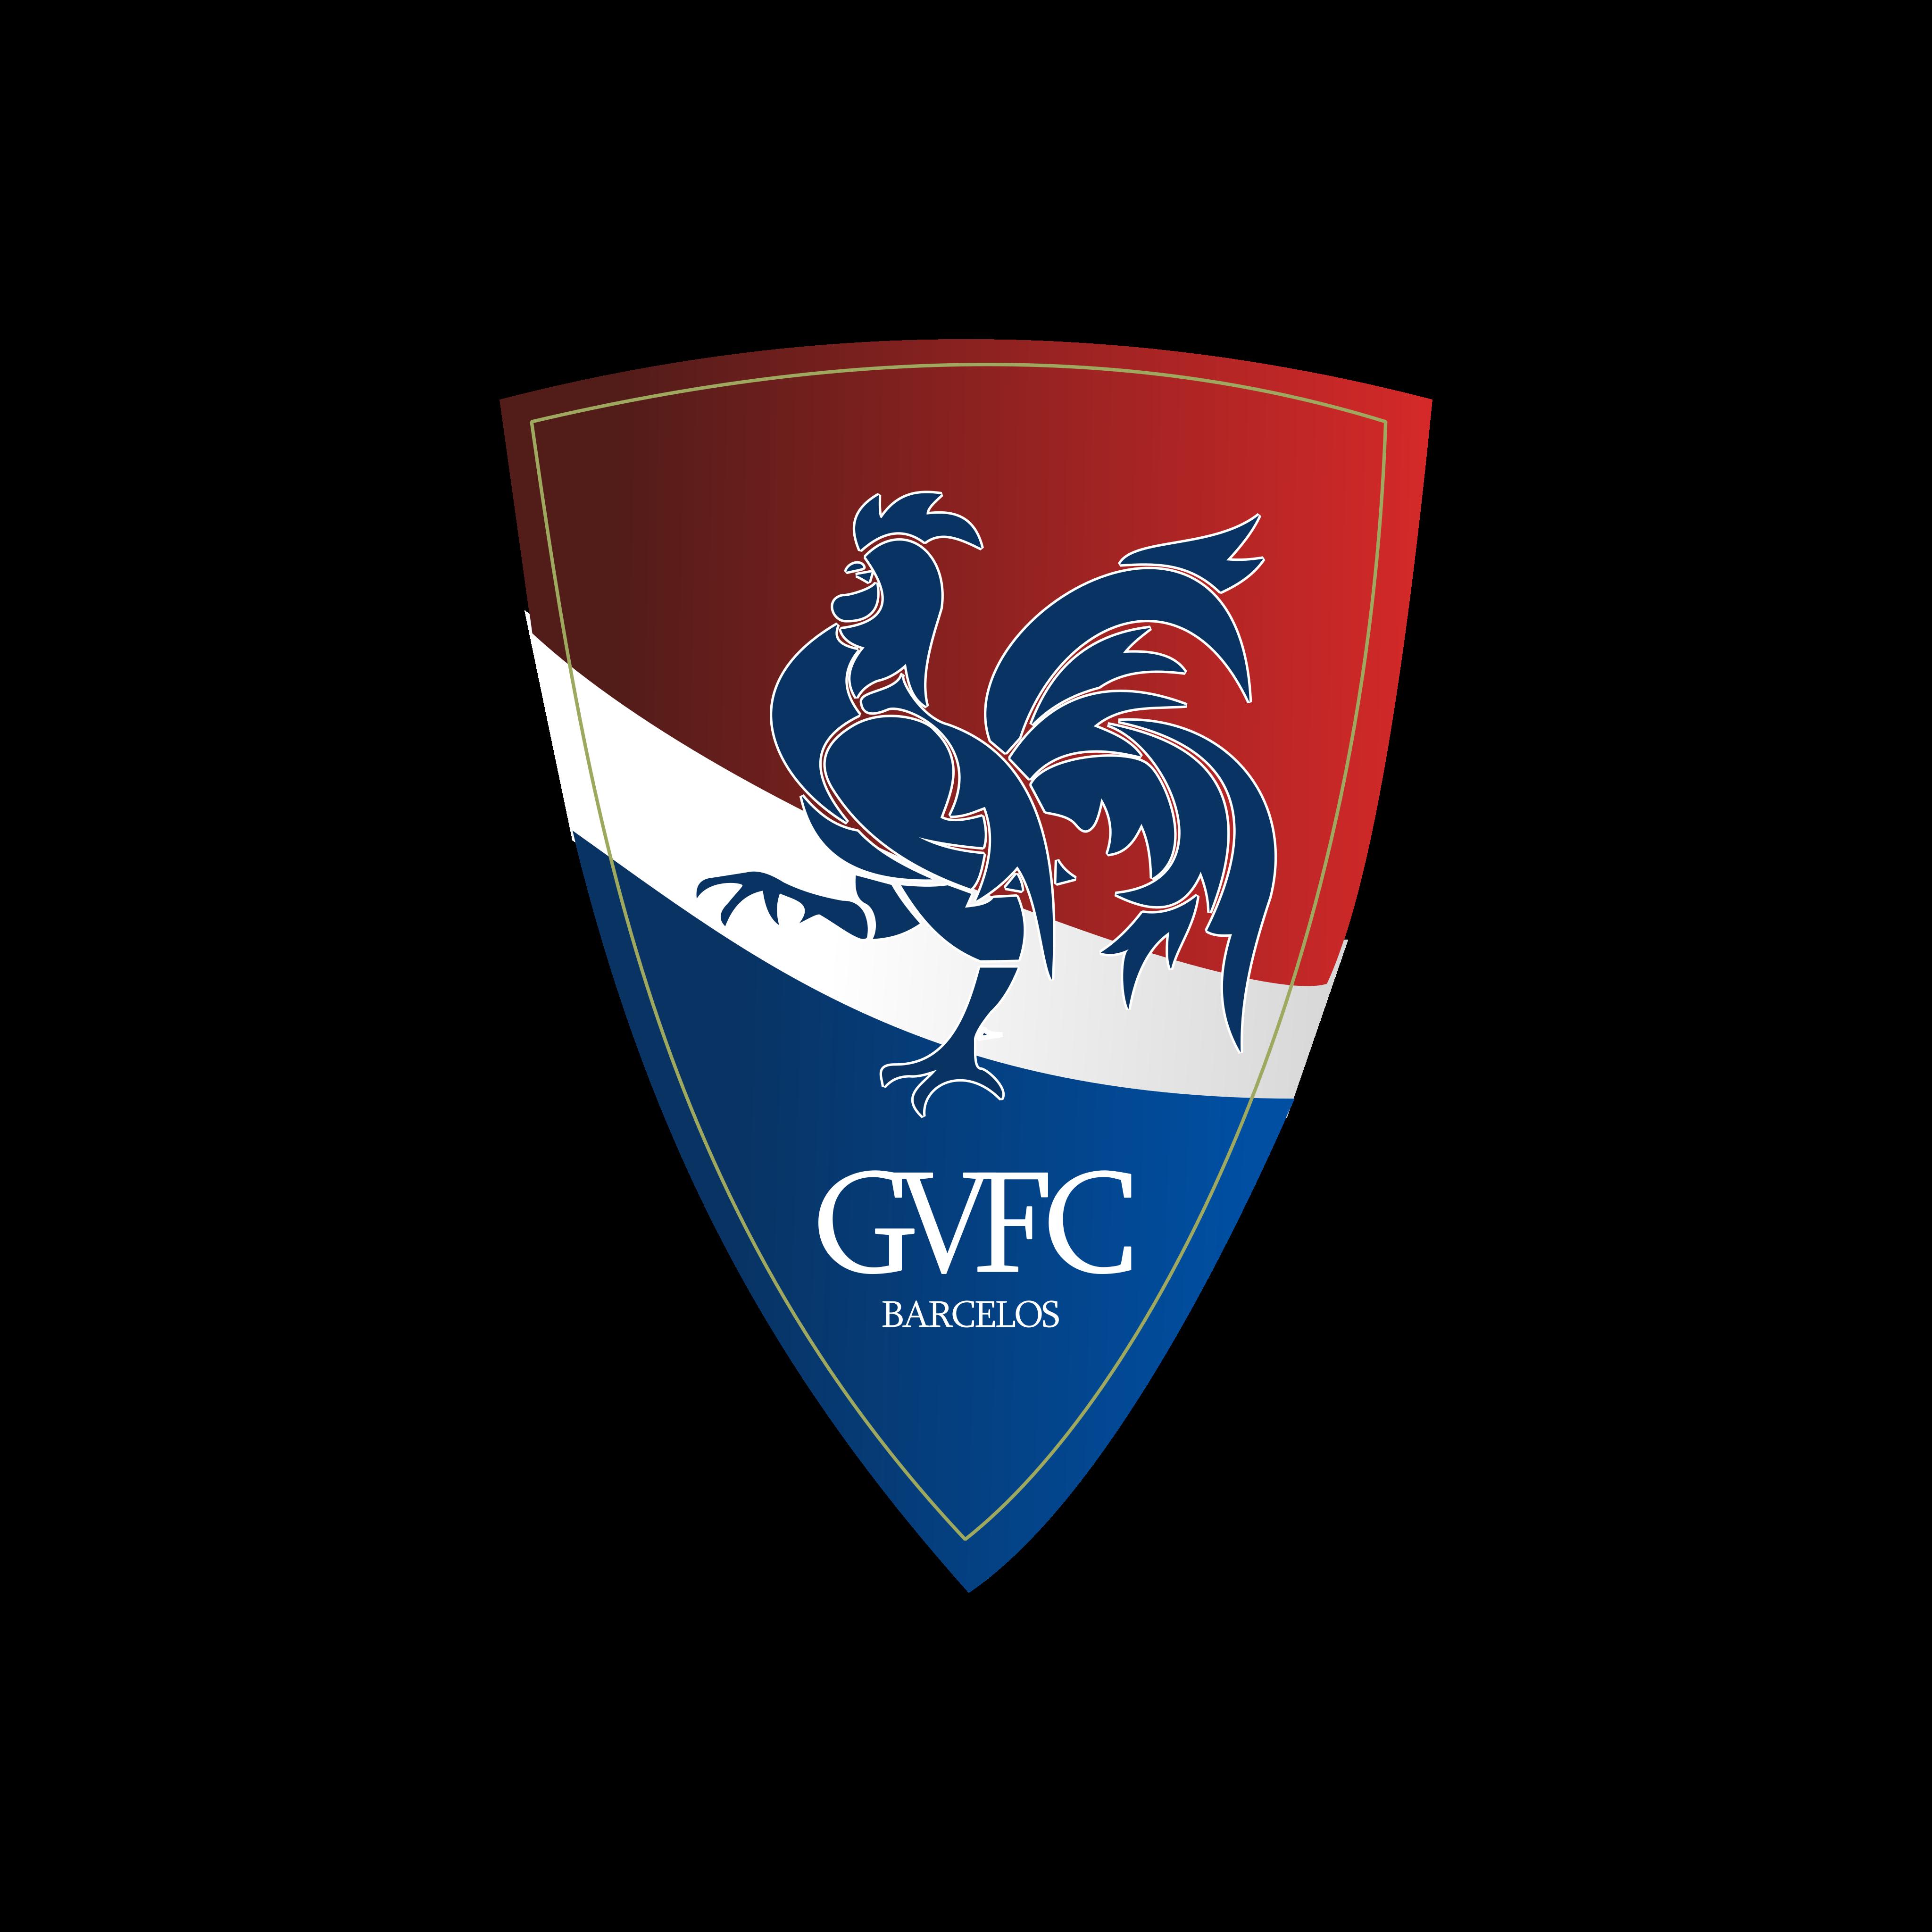 gil vicente fc logo 0 - Gil Vicente FC Logo